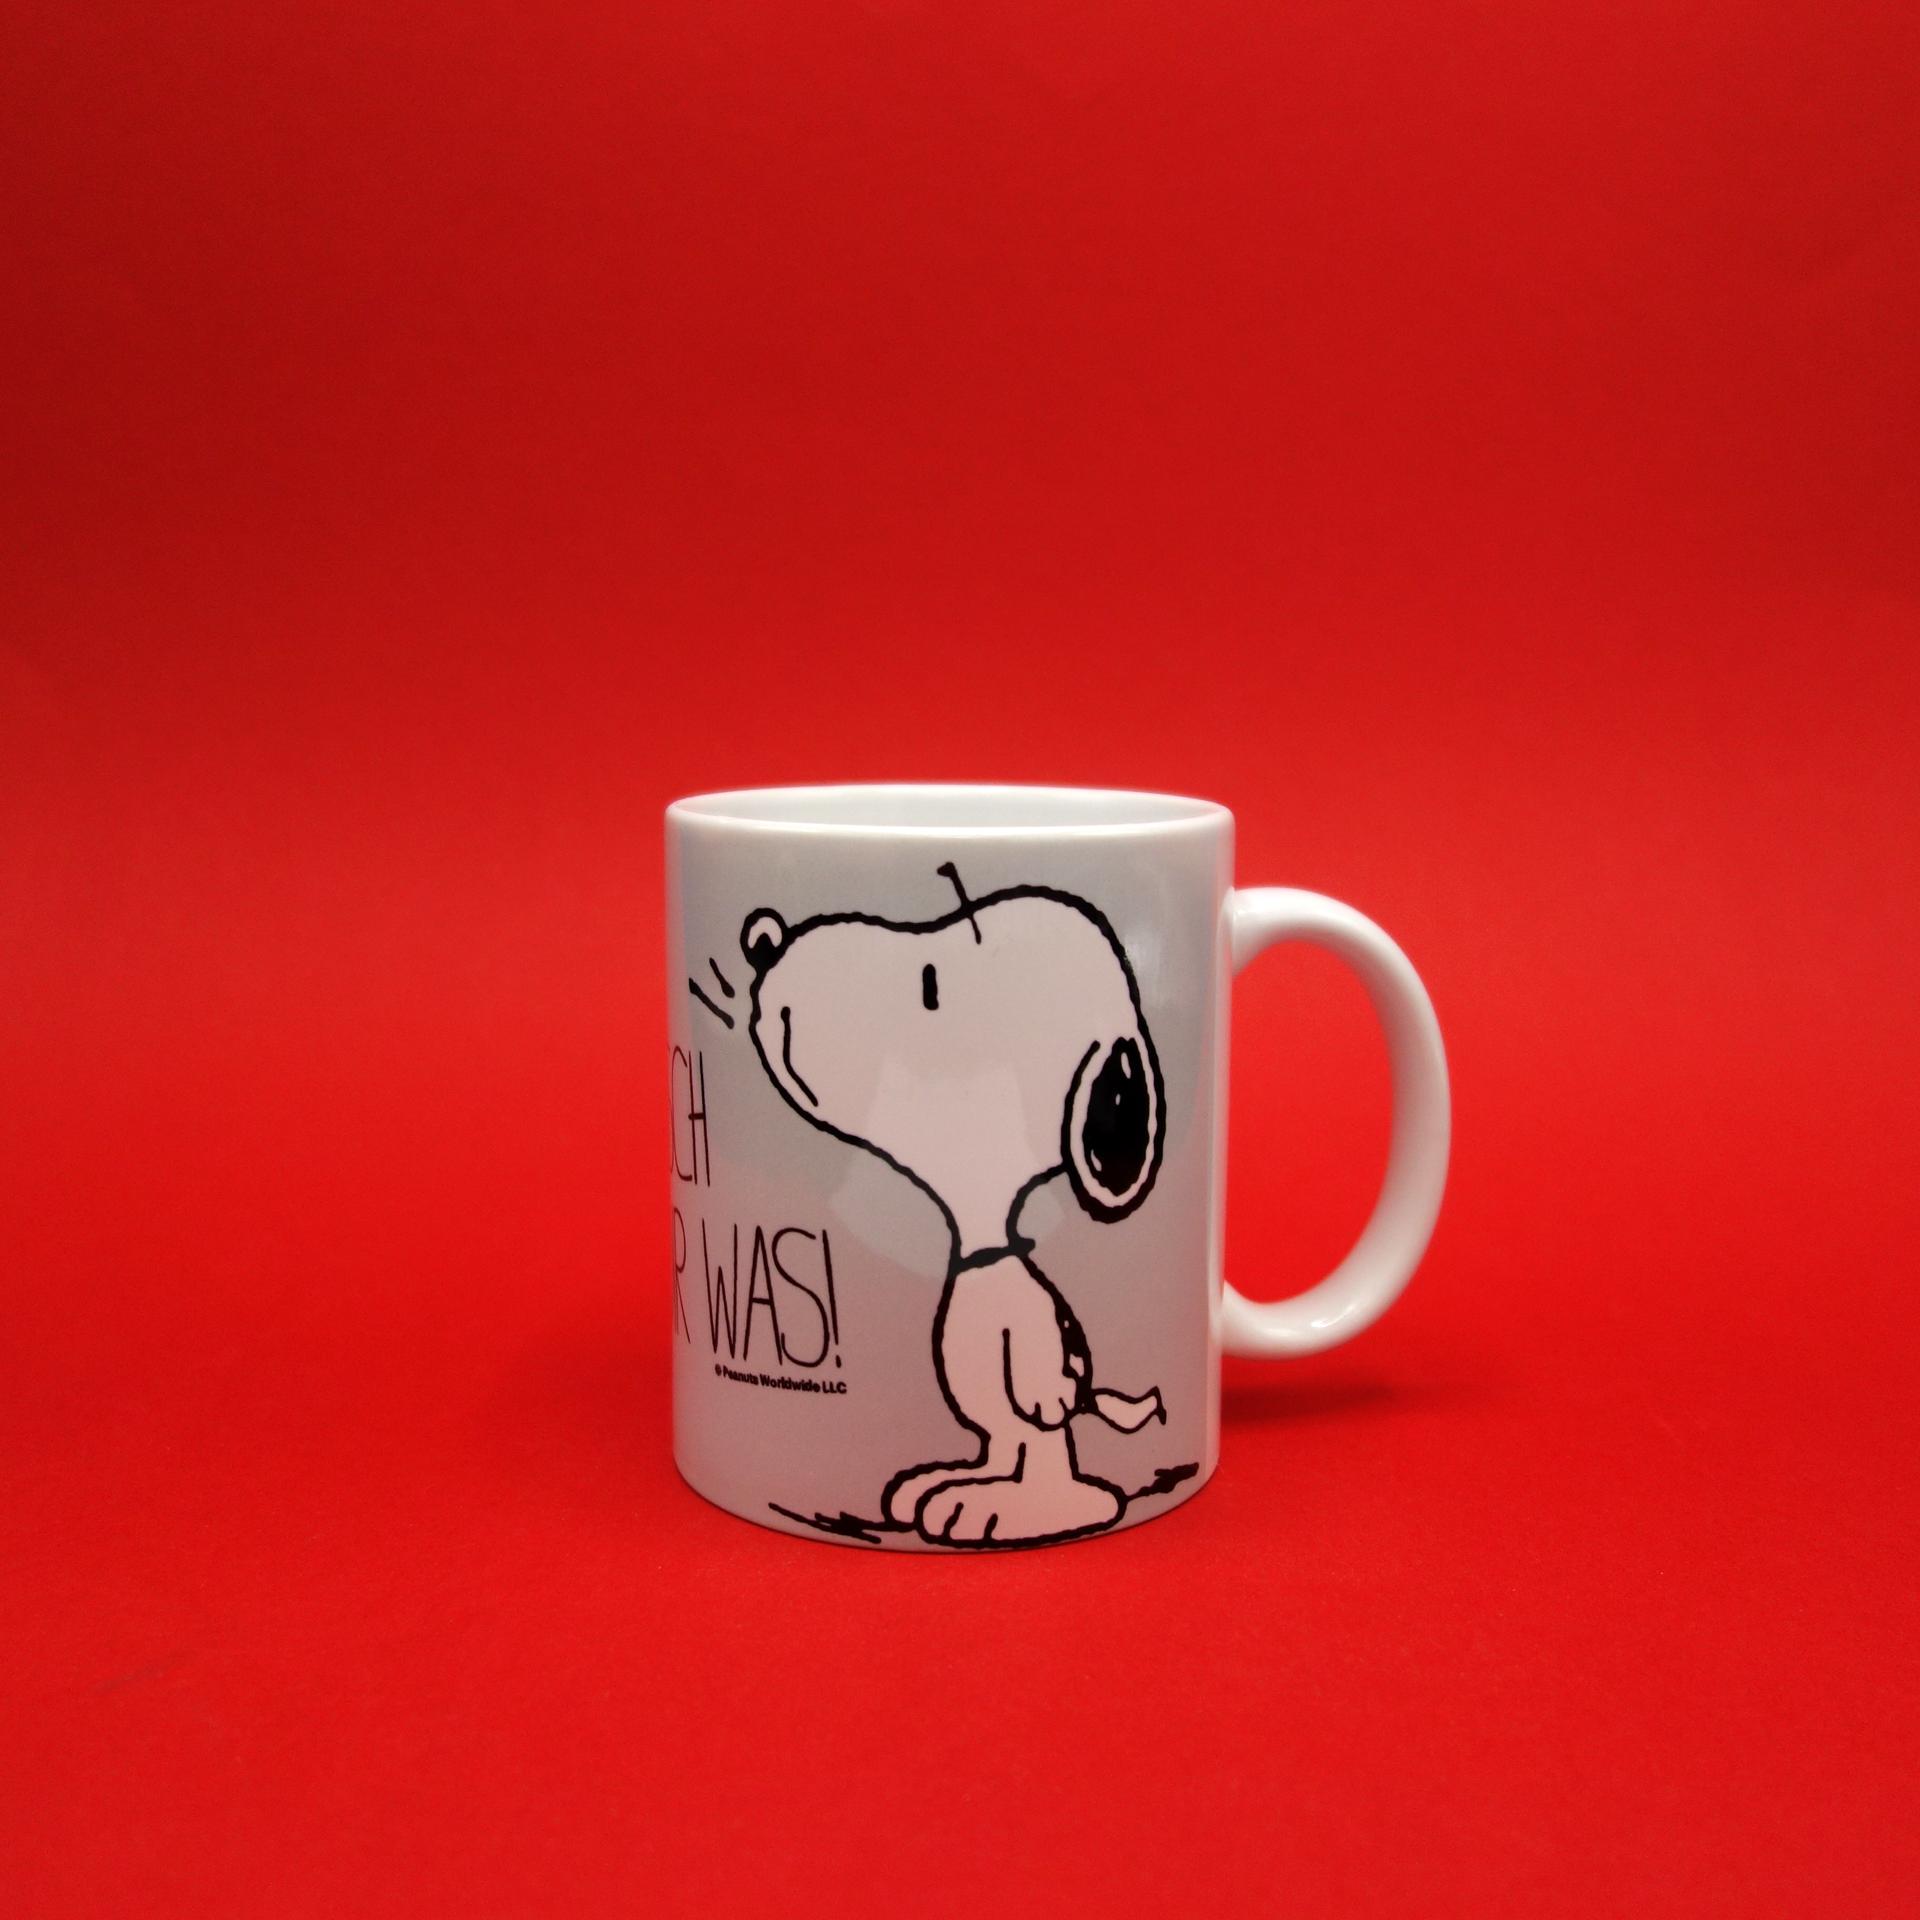 Snoopy Peanuts Tasse Wünsch Dir Was!